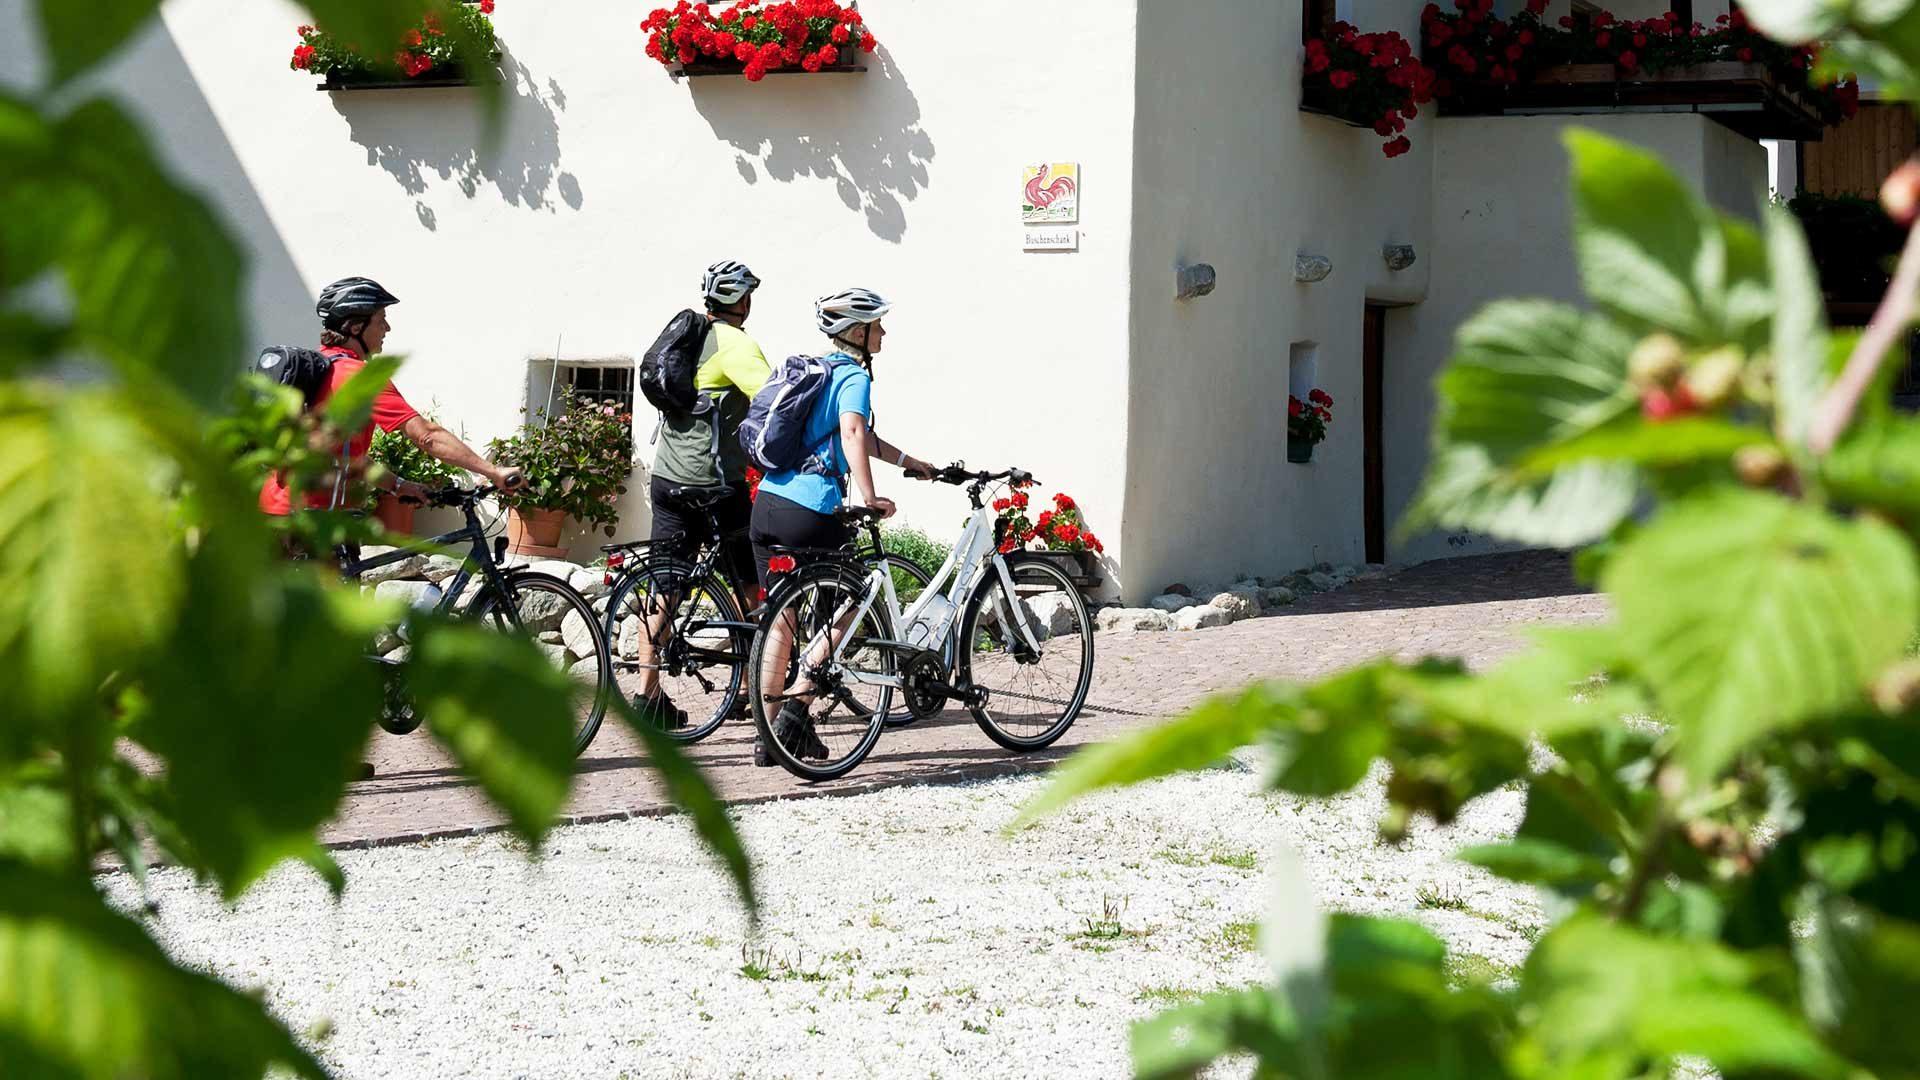 Pista ciclabile Val d'Adige Merano - Bolzano